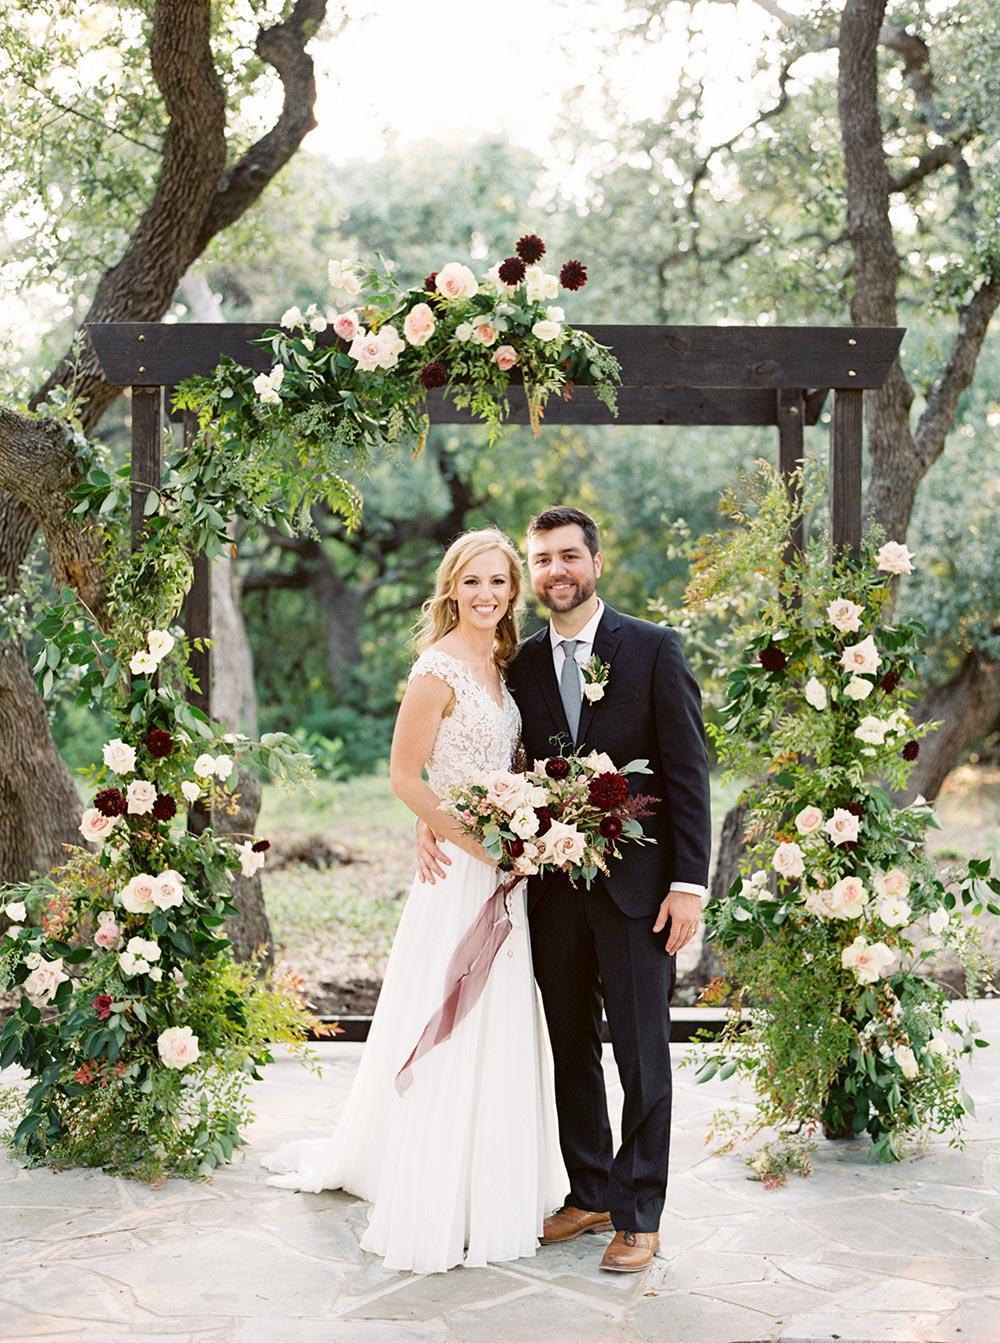 climbing flowers outdoor wedding ceremony arbor